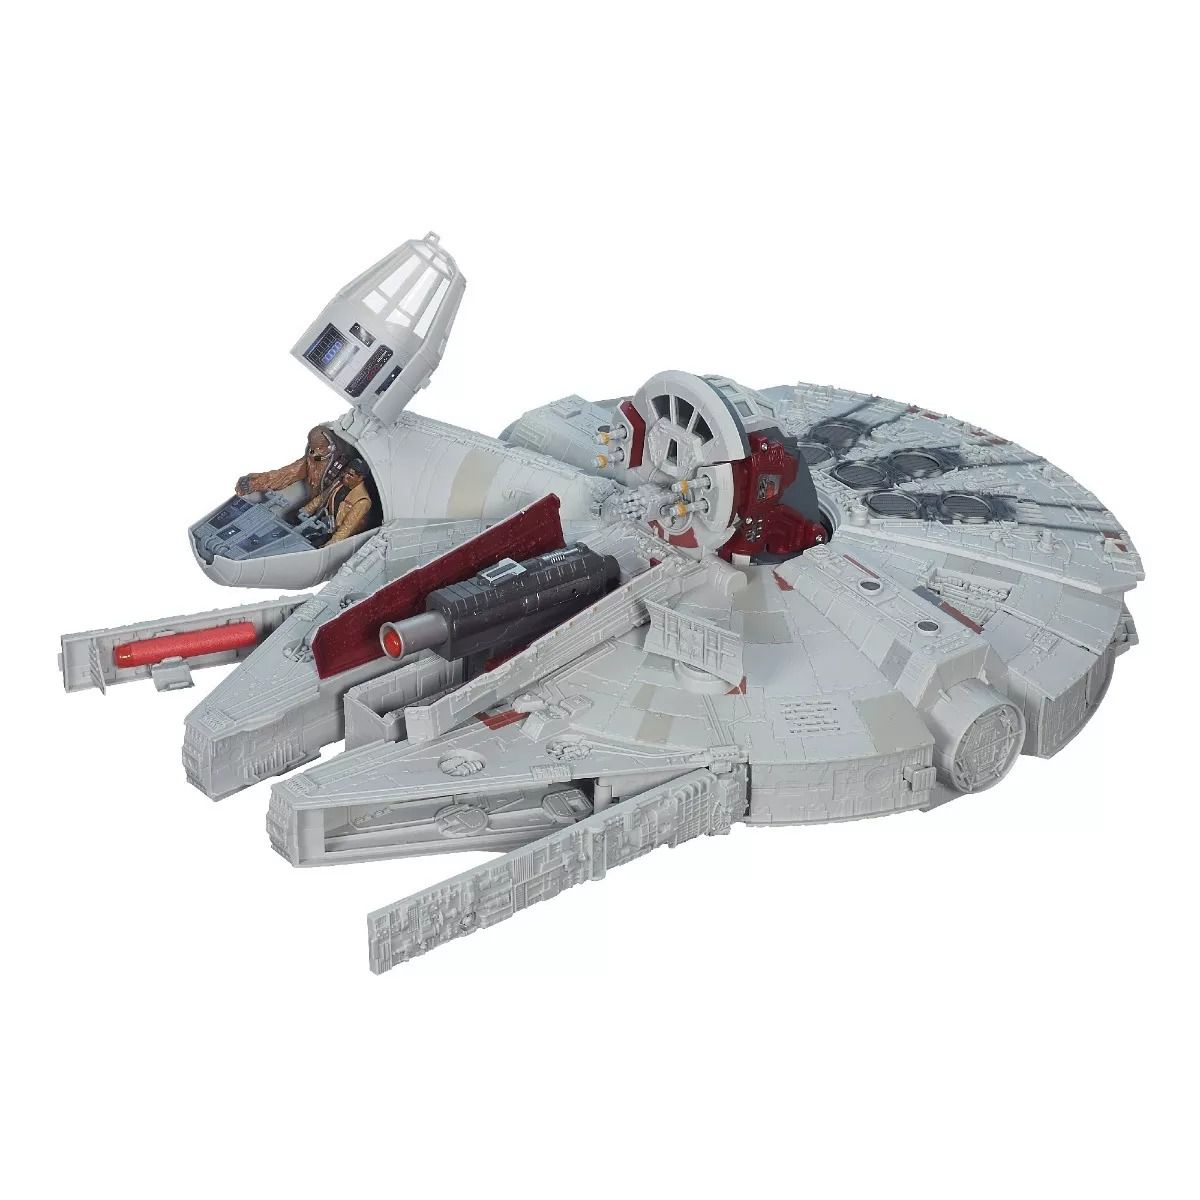 Star Wars Playset Millennium Falcon Deluxe Luz, Som E 3 Bonecos Hasbro  - Doce Diversão